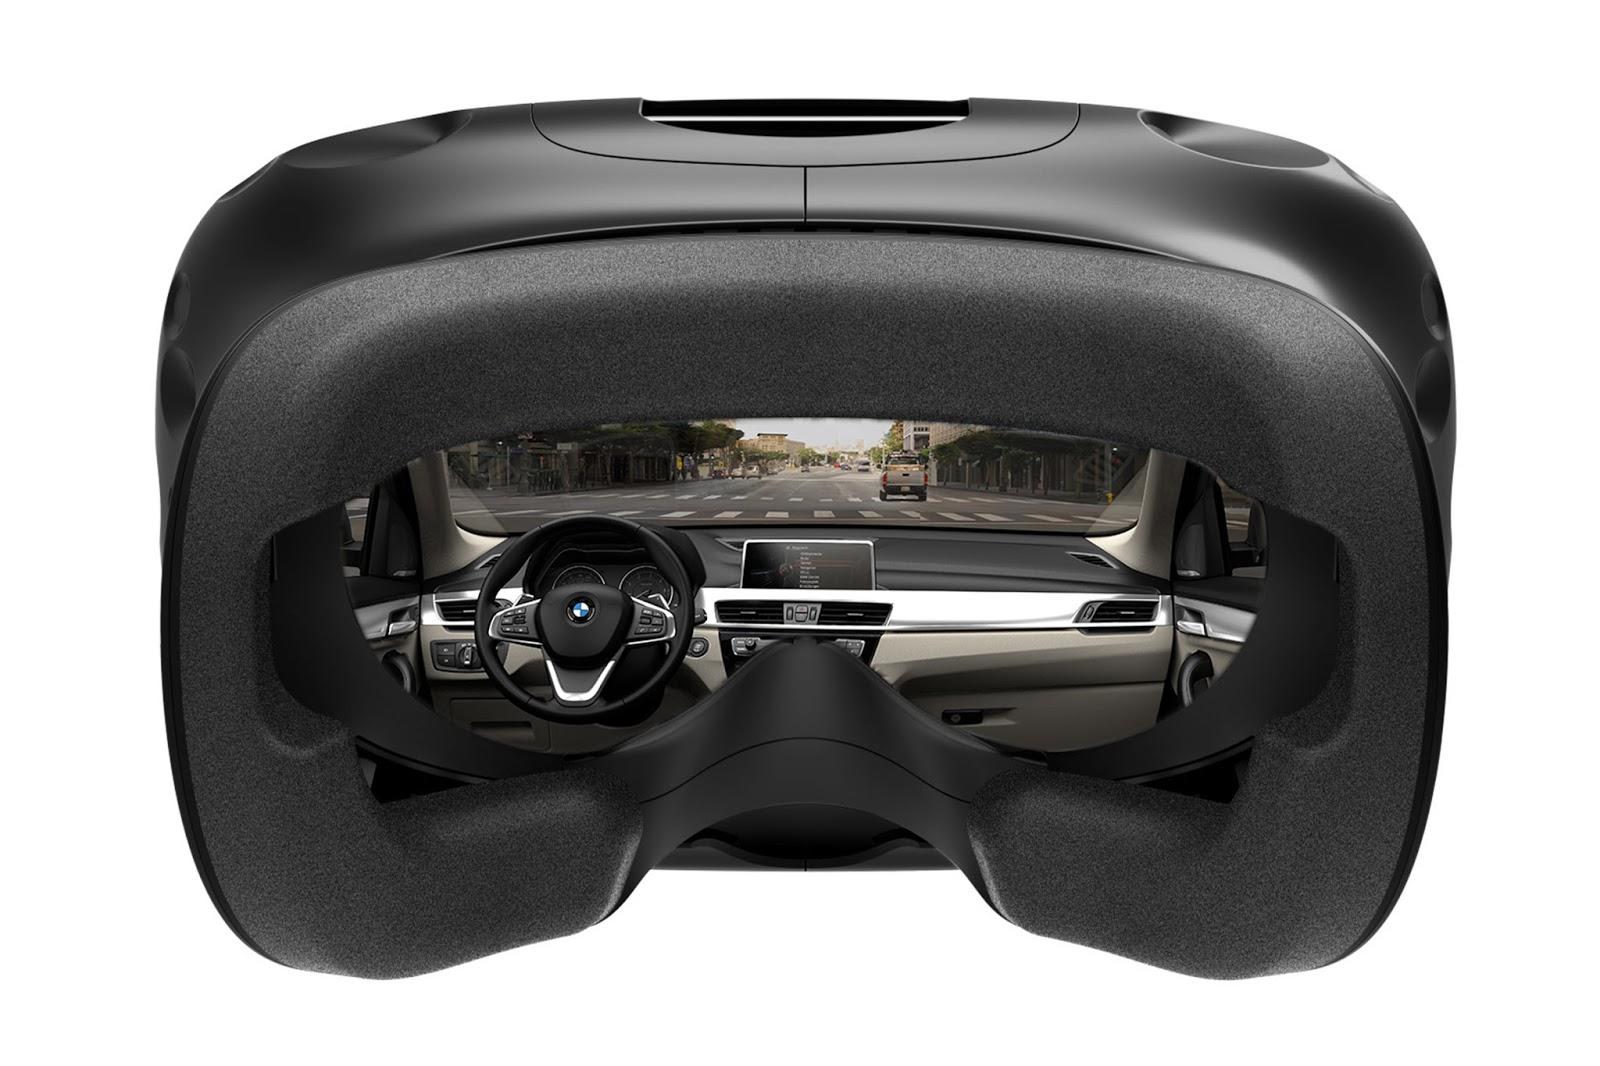 P90214940 highRes the virtual reality Που χρησιμοποιεί η BMW το Unreal Engine 4 της Epic Games και τα συστήματα εικονικής πραγματικότητας BMW, HTC, Virtual Reality, Τεχνολογία